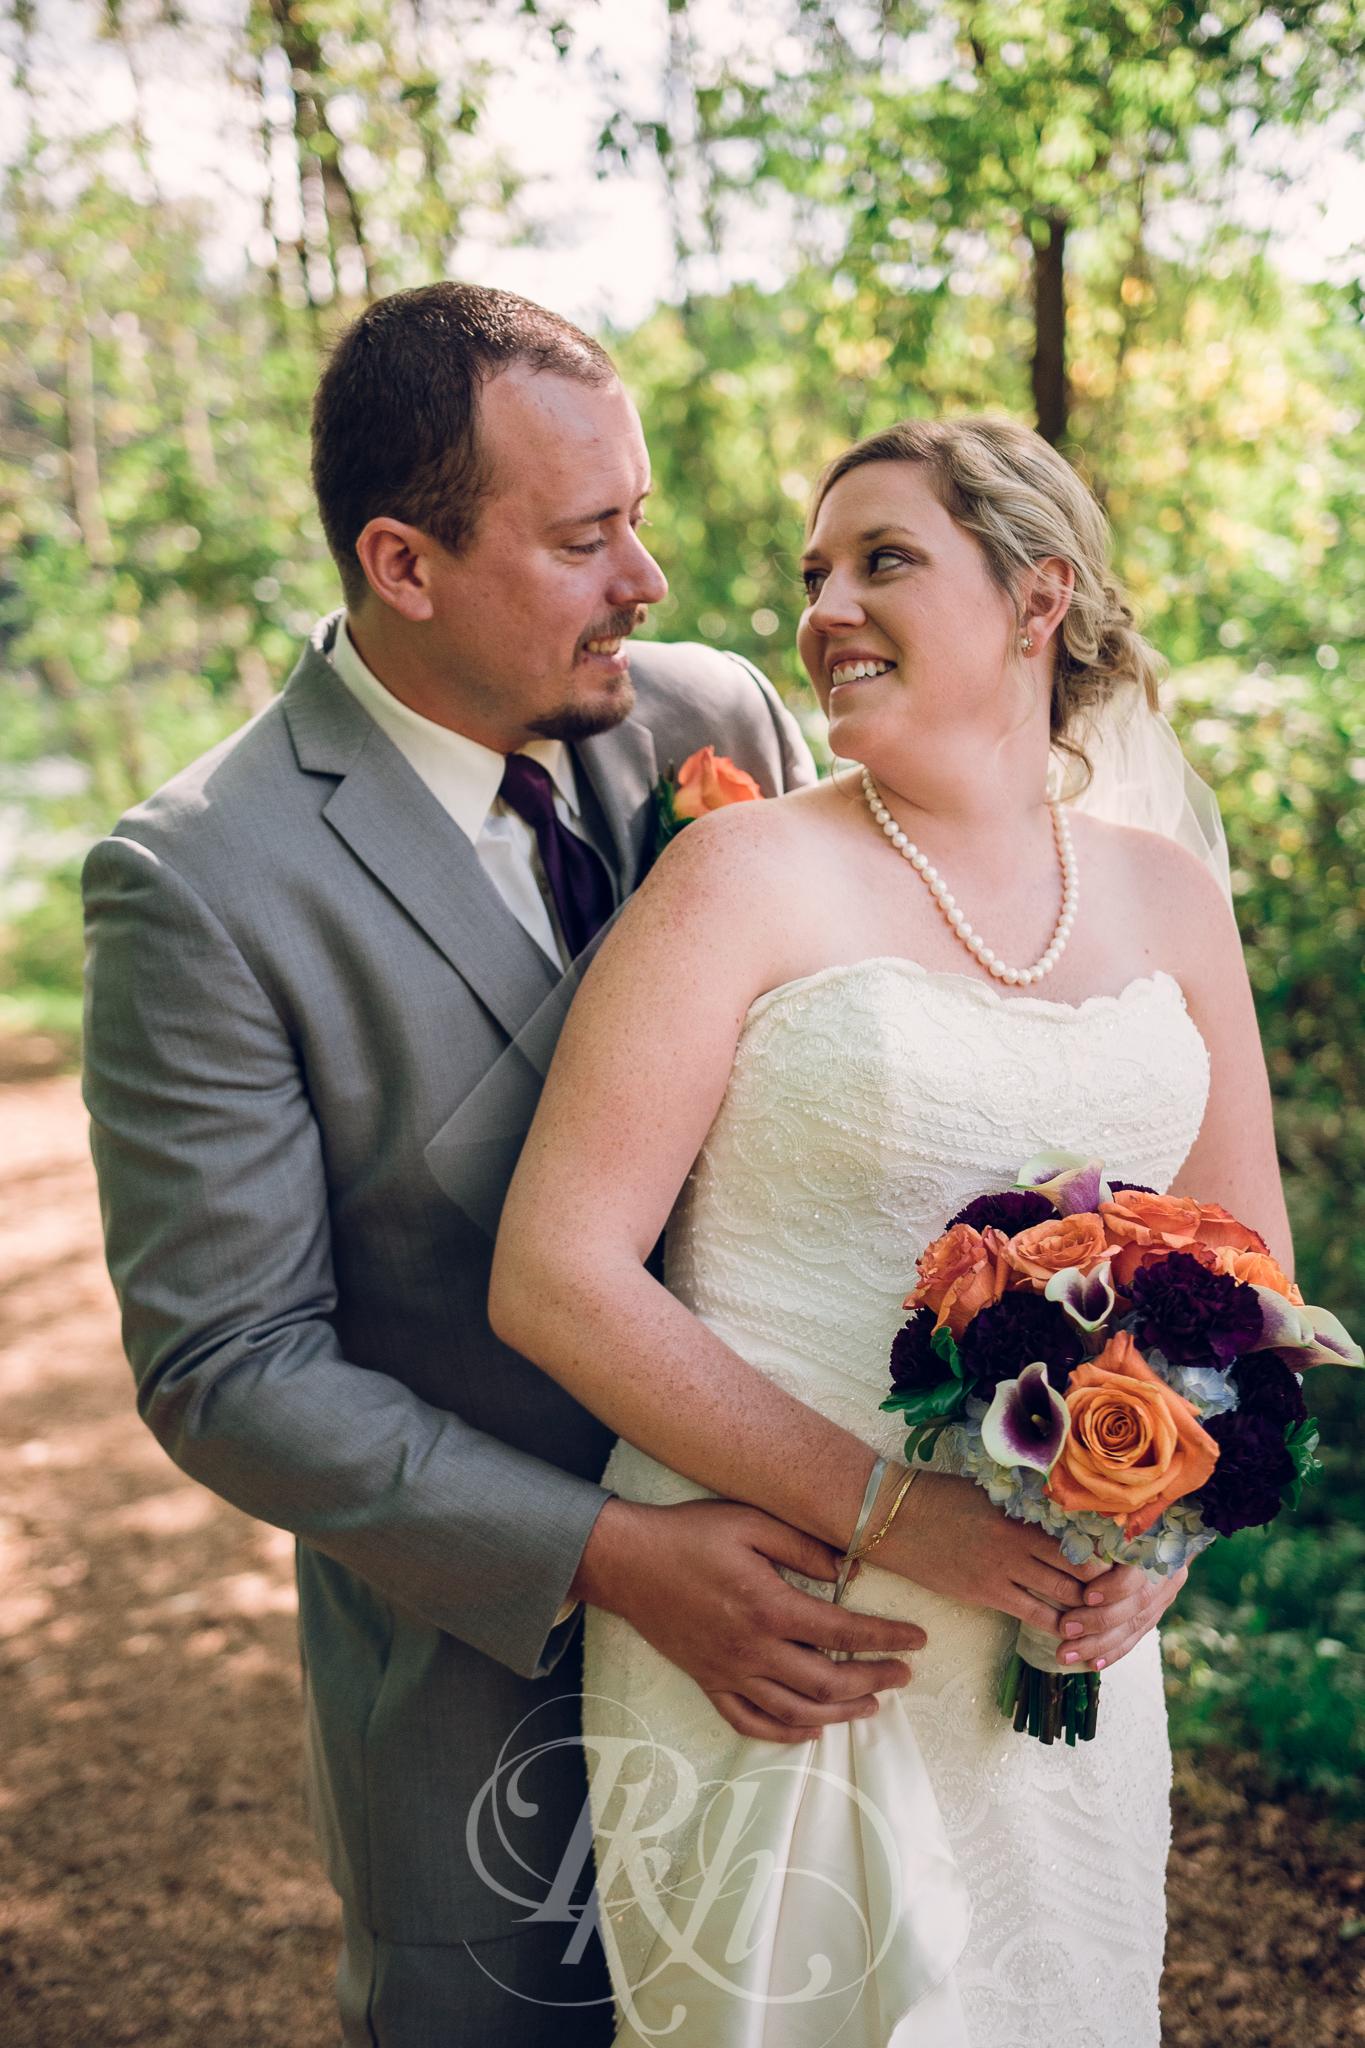 Jackie & Corey - Minnesota Wedding Photography - RKH Images -11.jpg